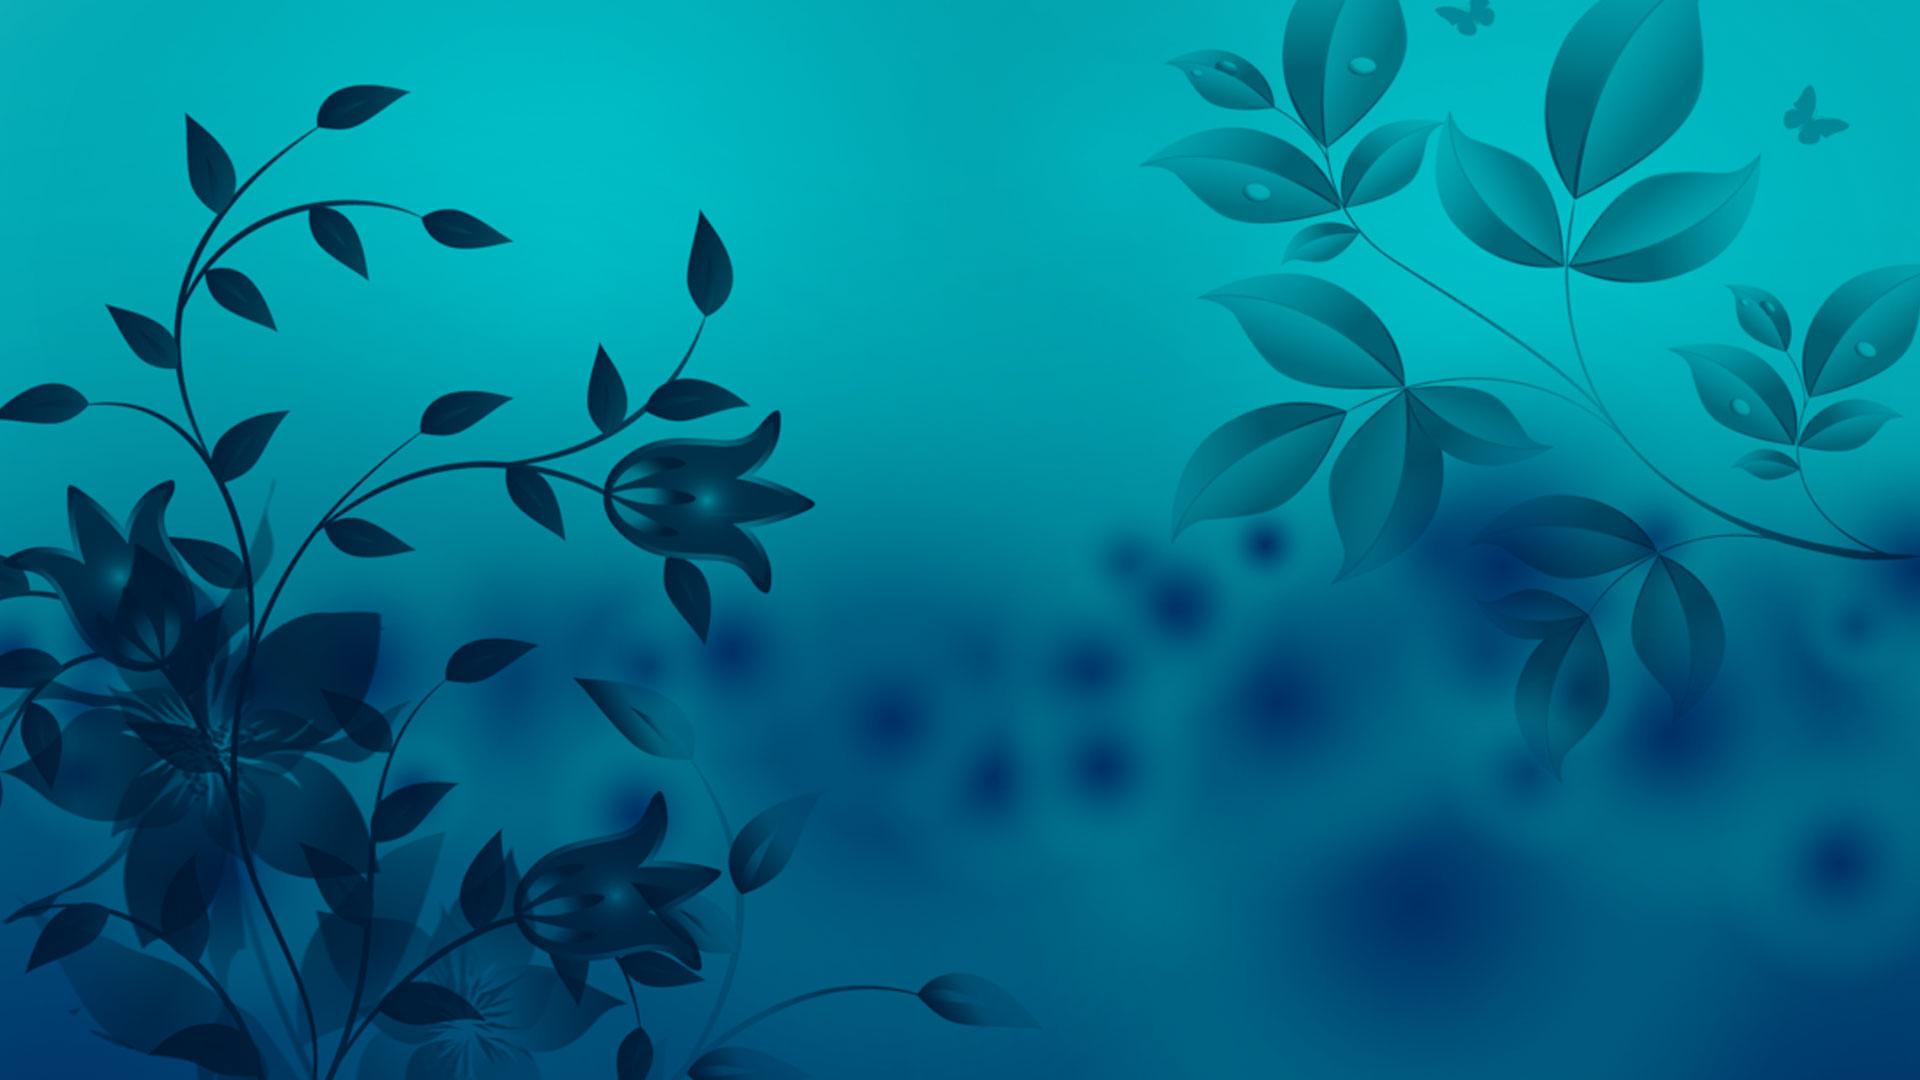 Mistique Blue Flower Background